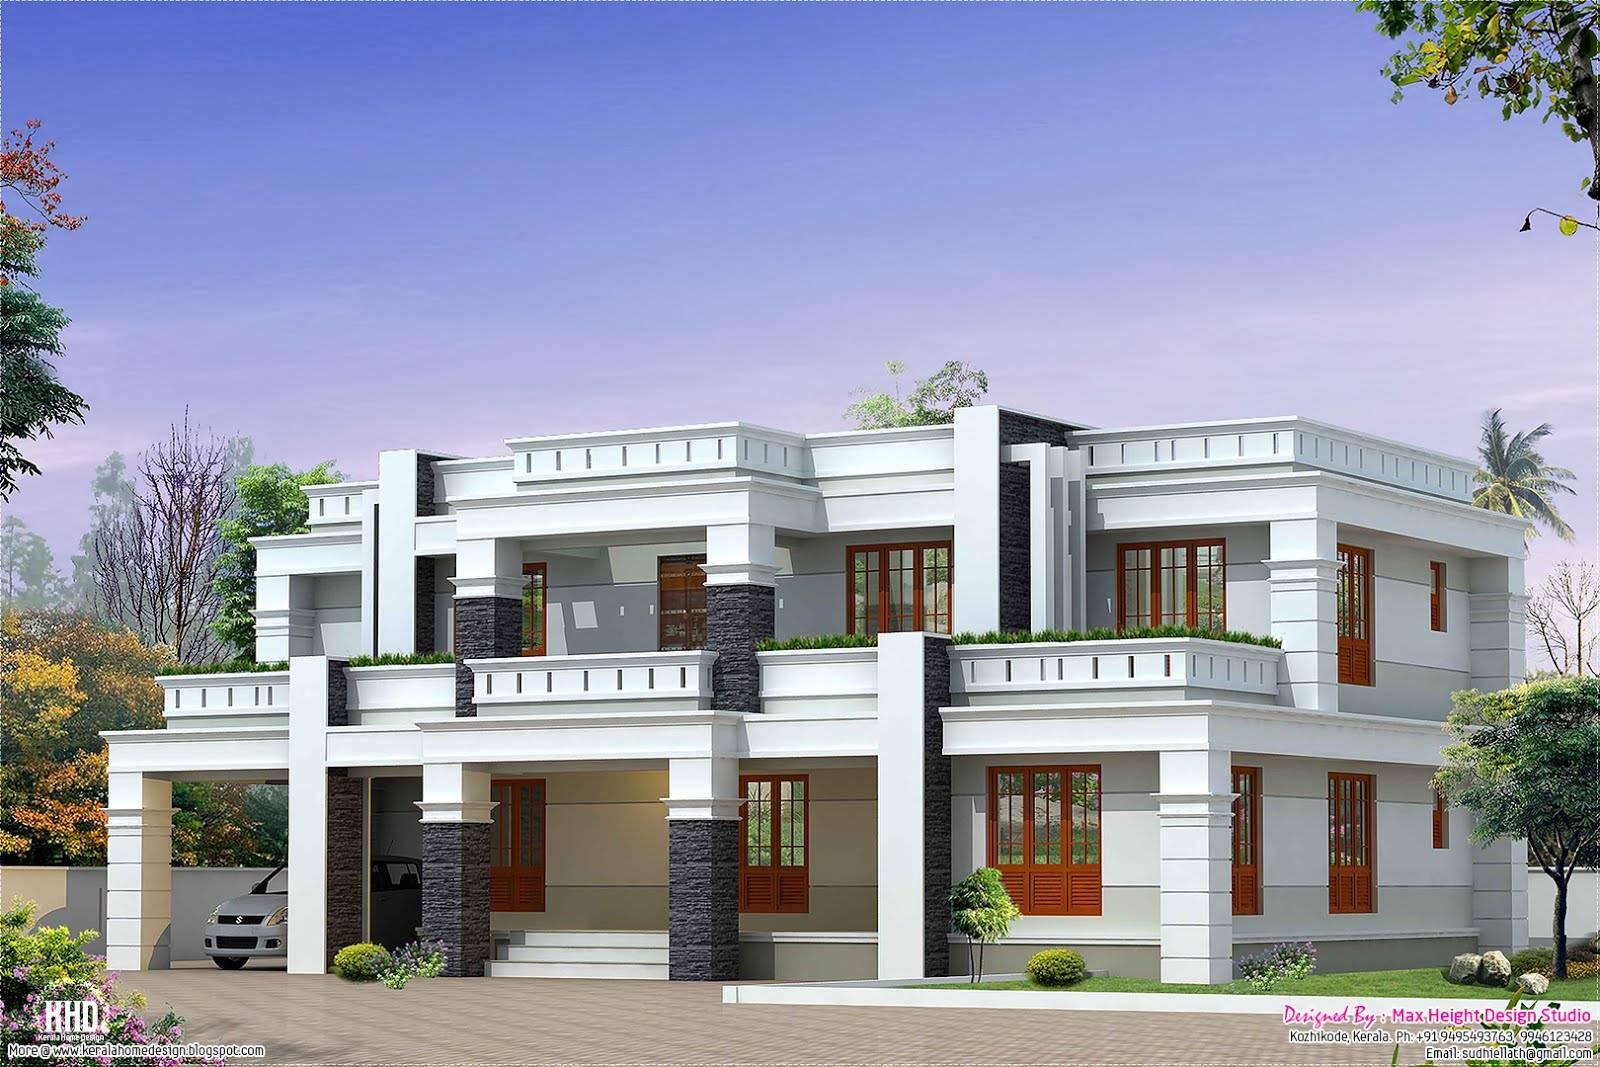 Flat Roof Luxury Home Design Kerala House Plans 35378